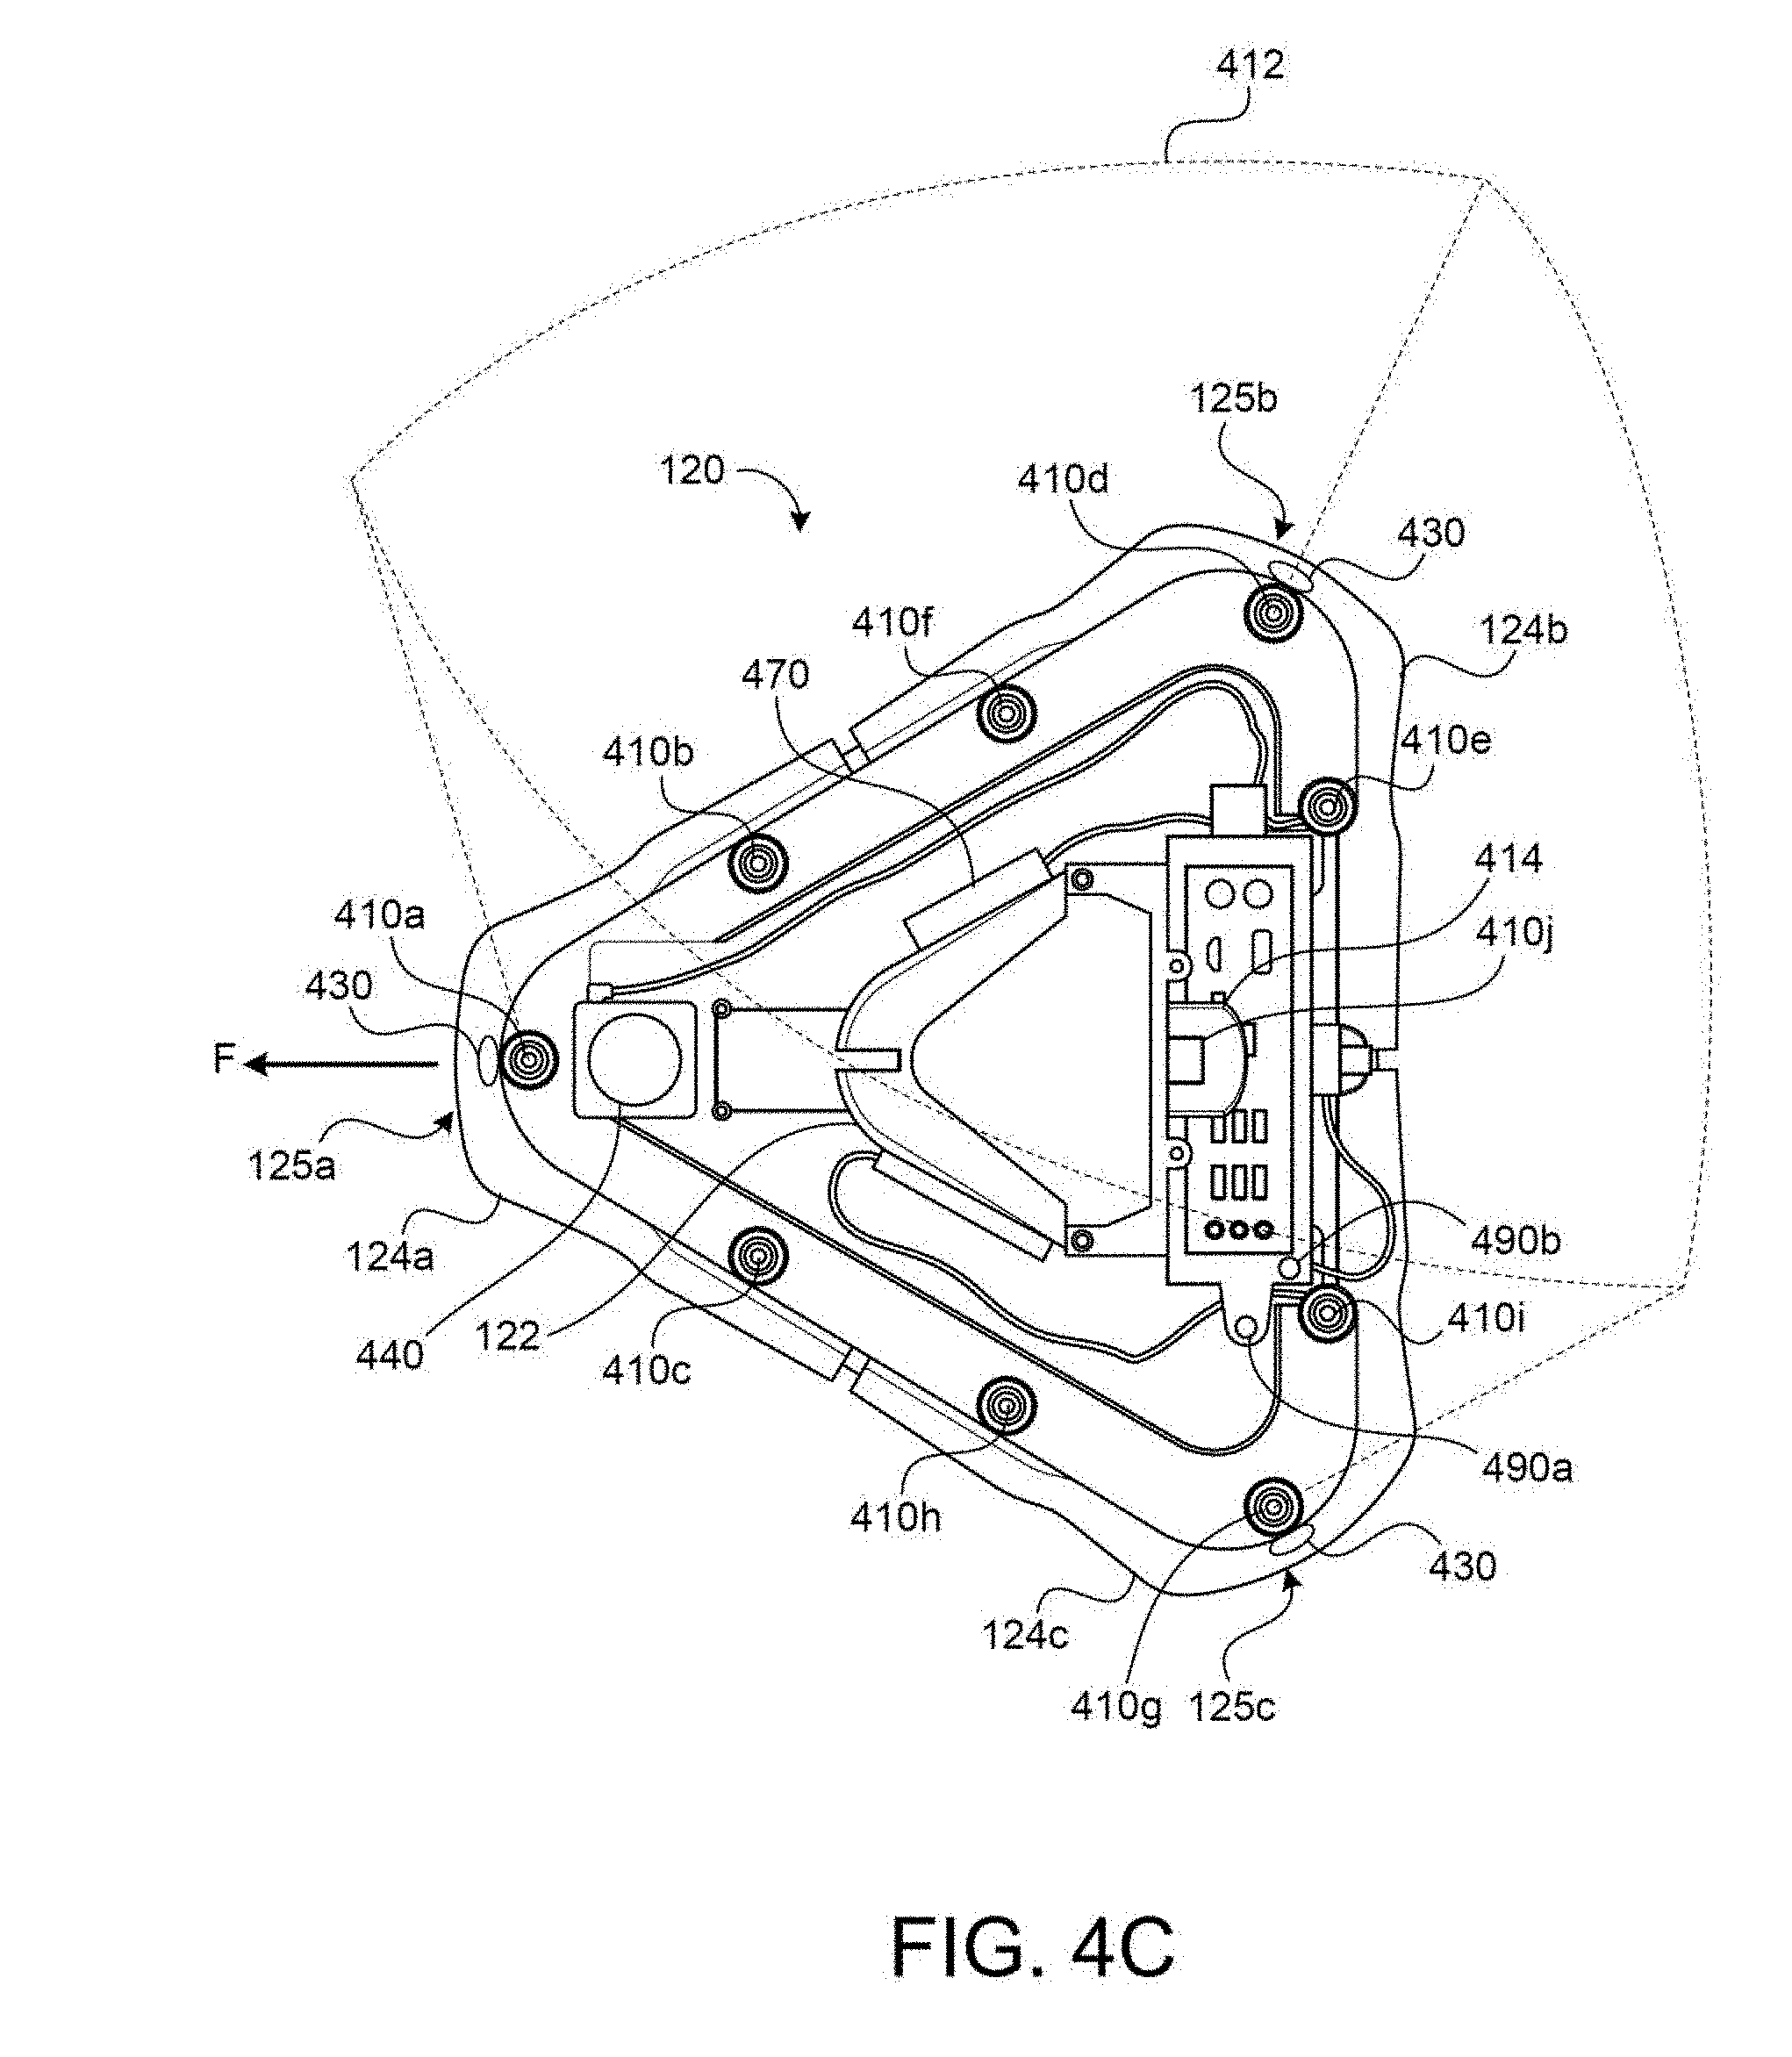 Patent US 9,785,149 B2